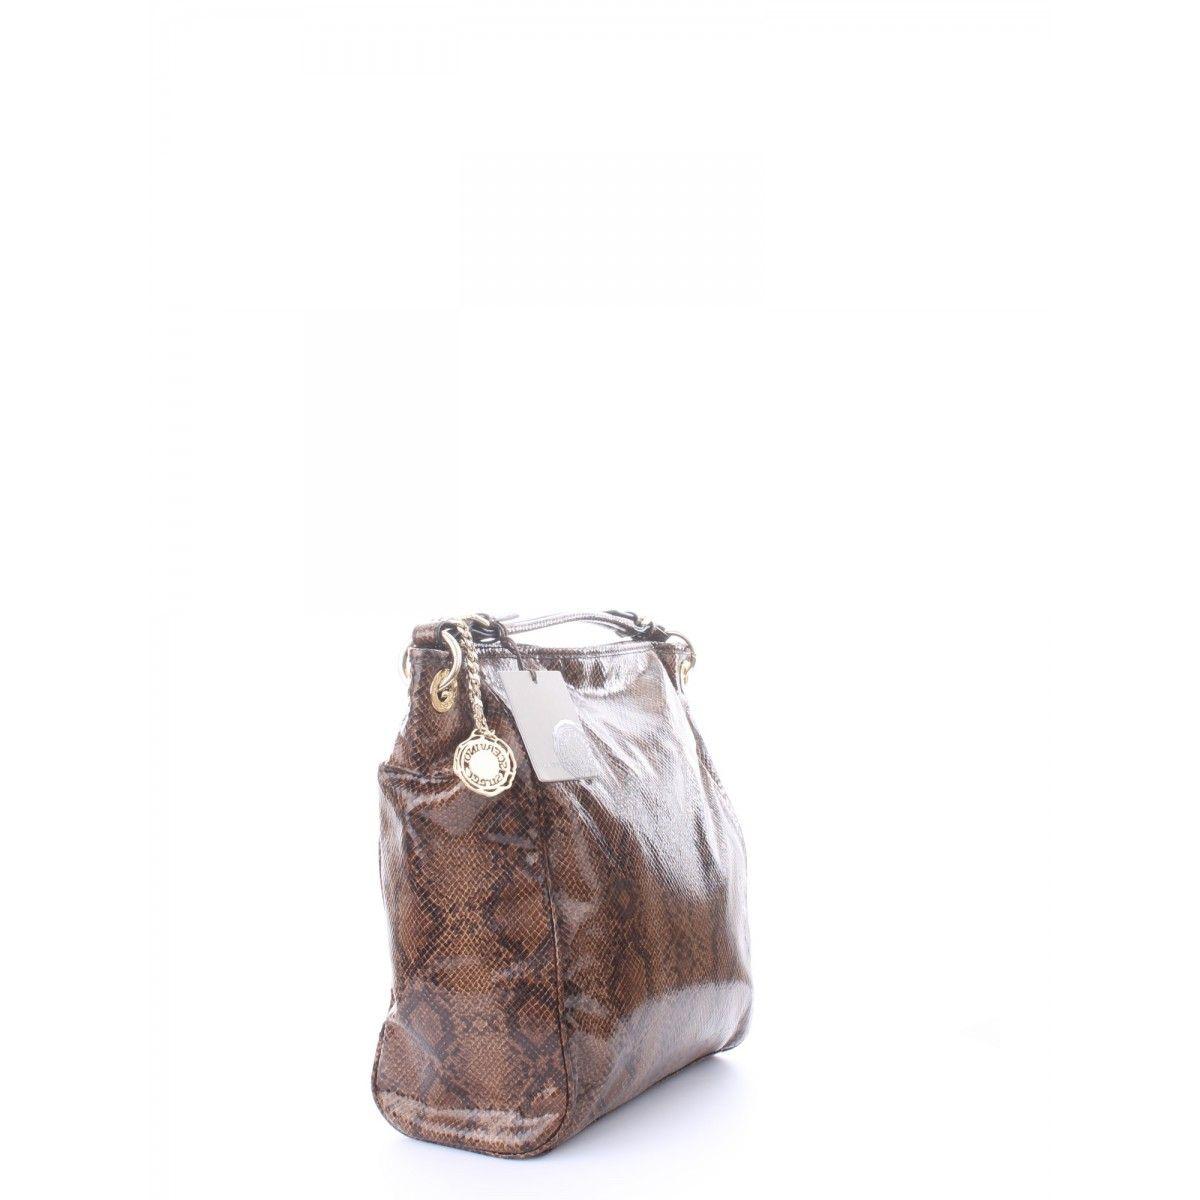 7270d4b83f6a Cromia - Ladies bag mina ne 1403625